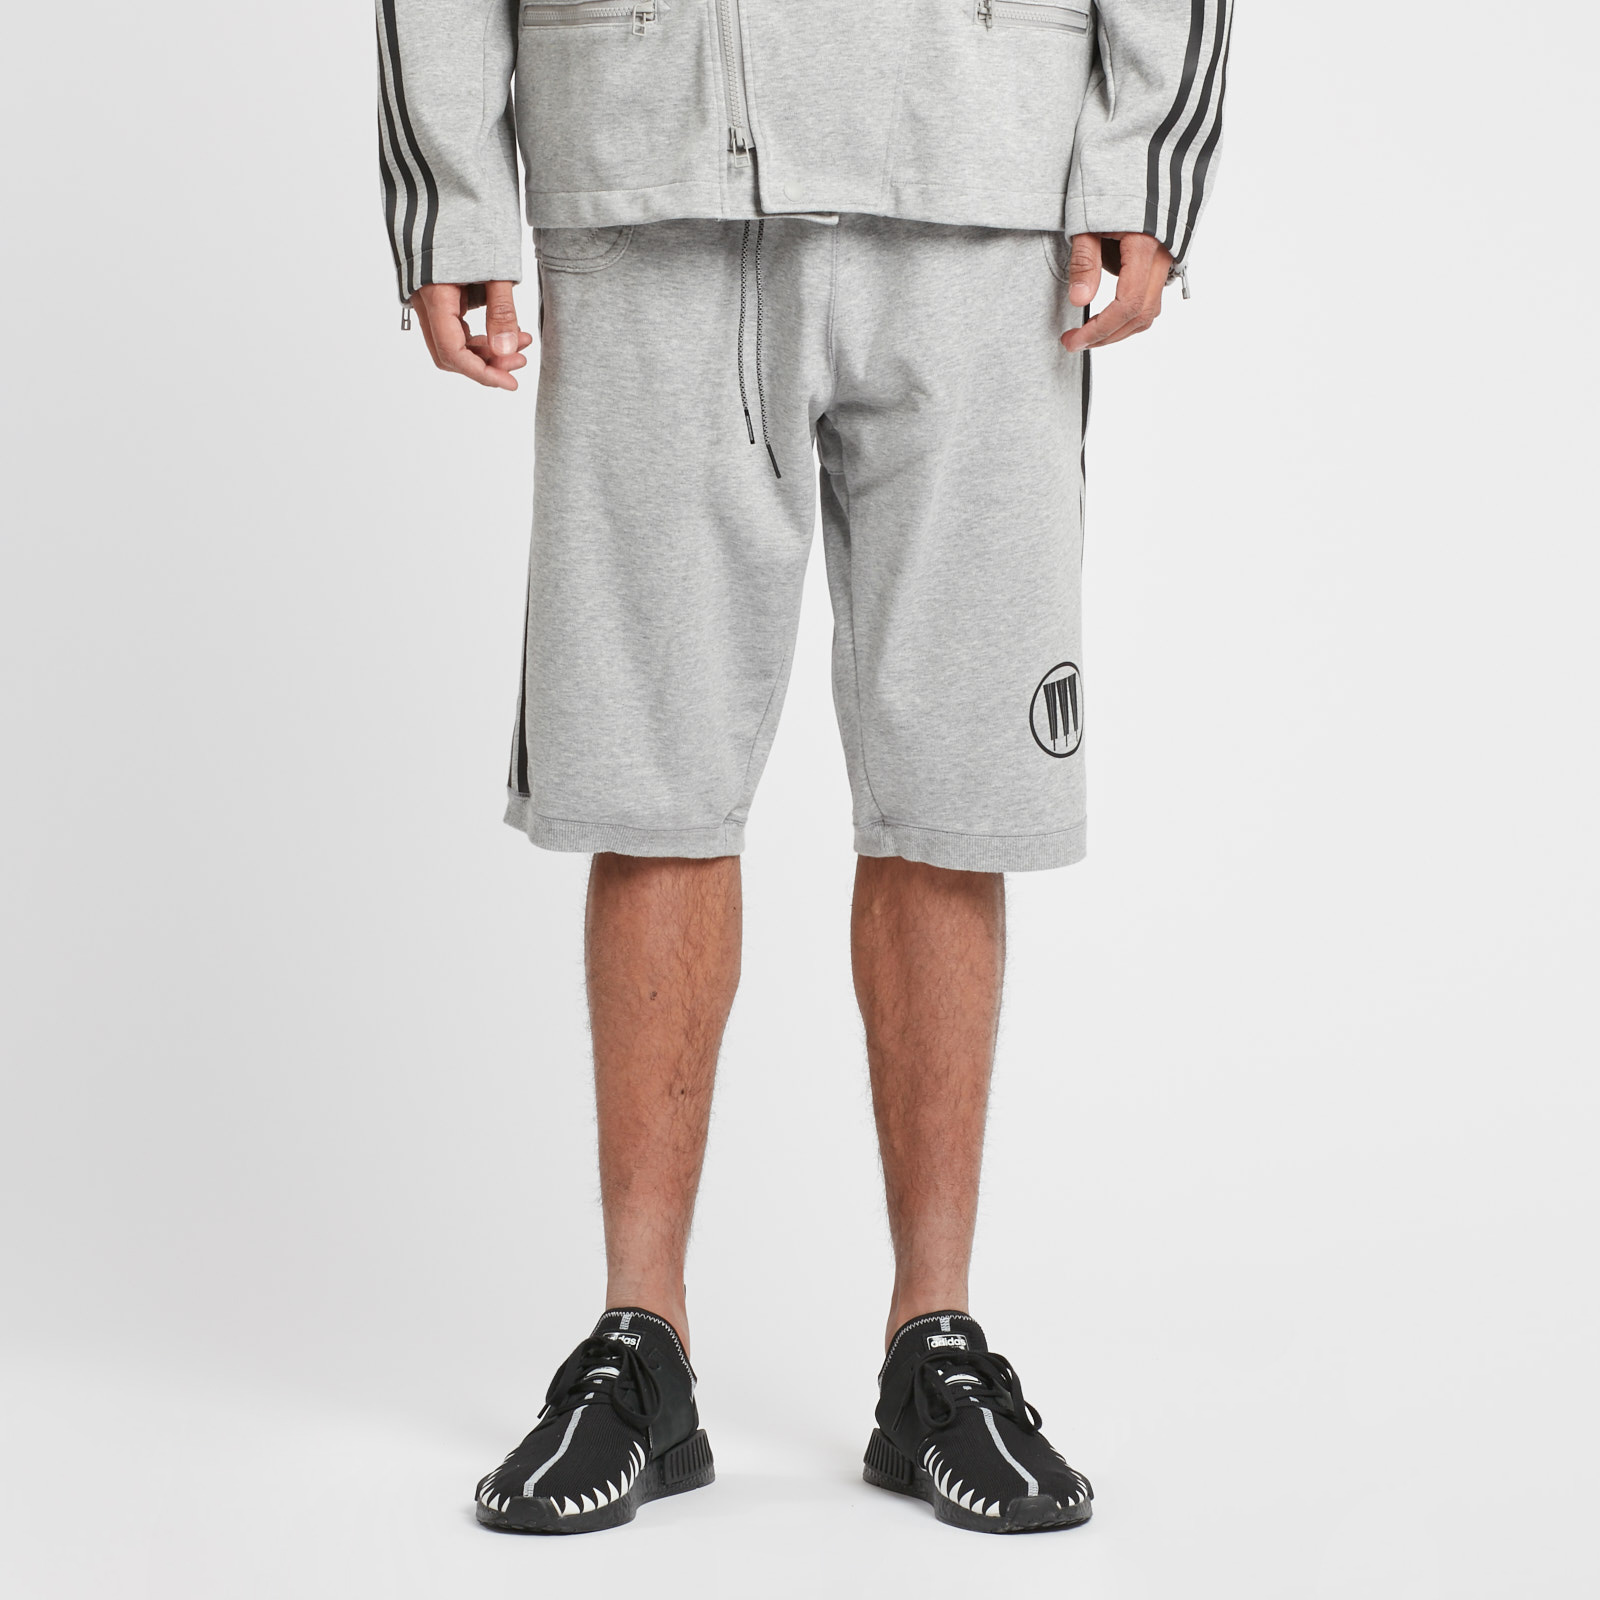 3de09e920338 adidas Riders Track Shorts x Neighborhood - Cd7735 - Sneakersnstuff ...